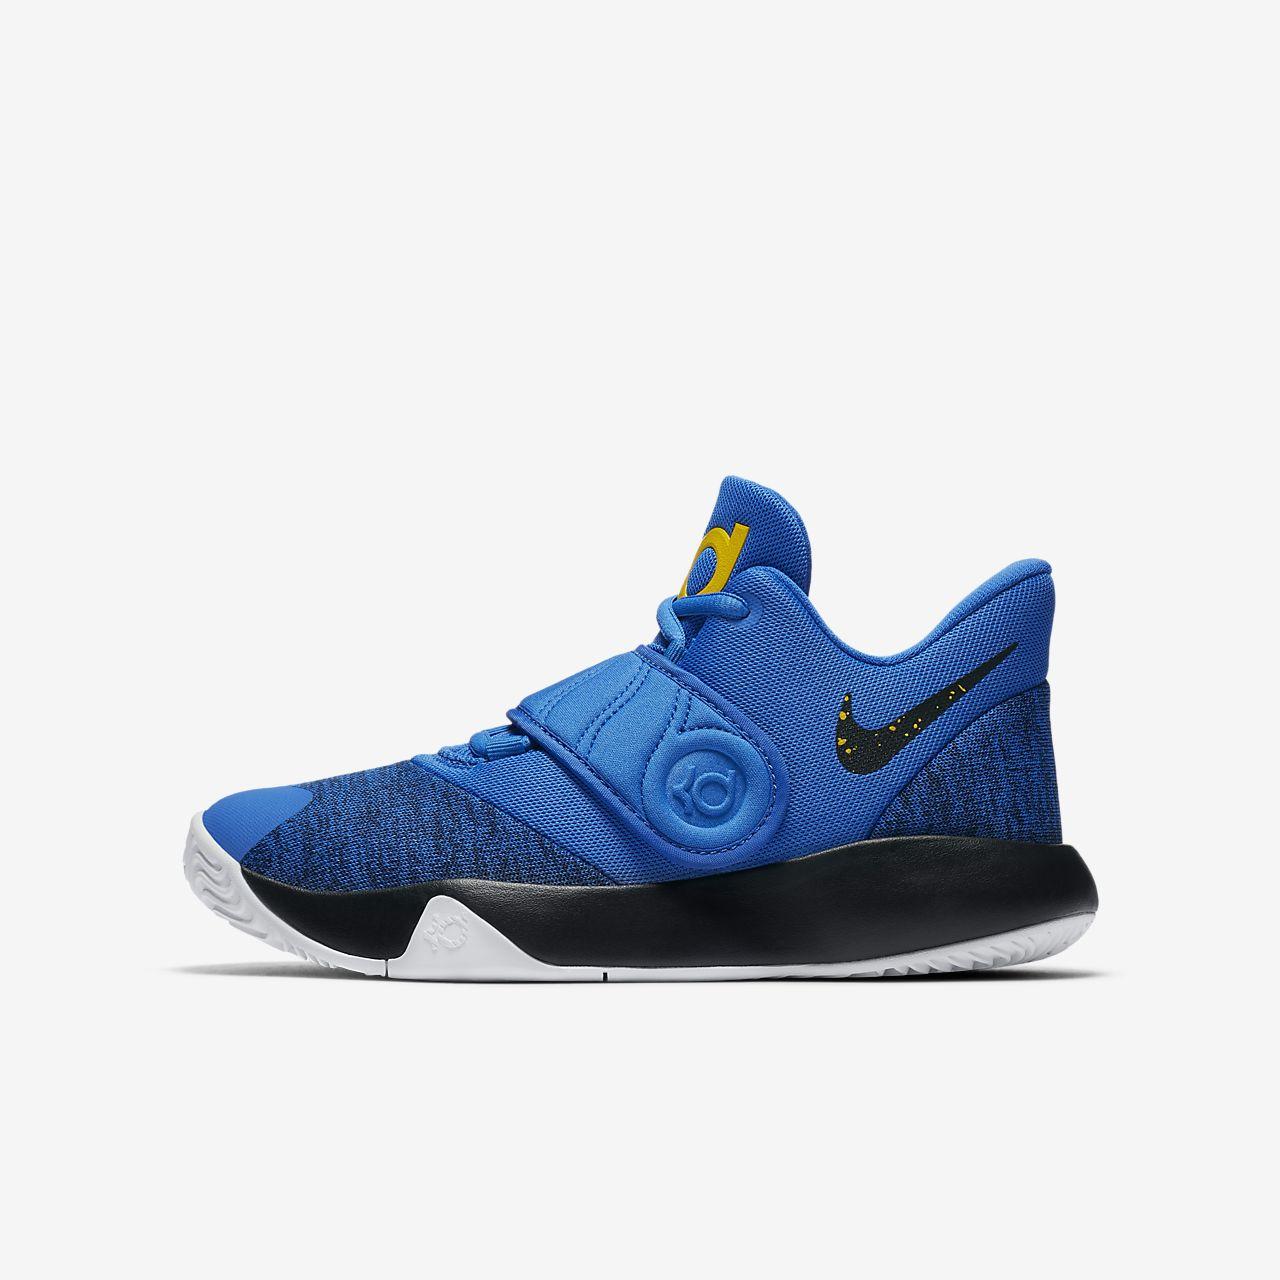 premium selection c6dce a7077 ... get nike performance kd trey 5 vi basketball shoes signal blue black  white c20c3 1a7c8